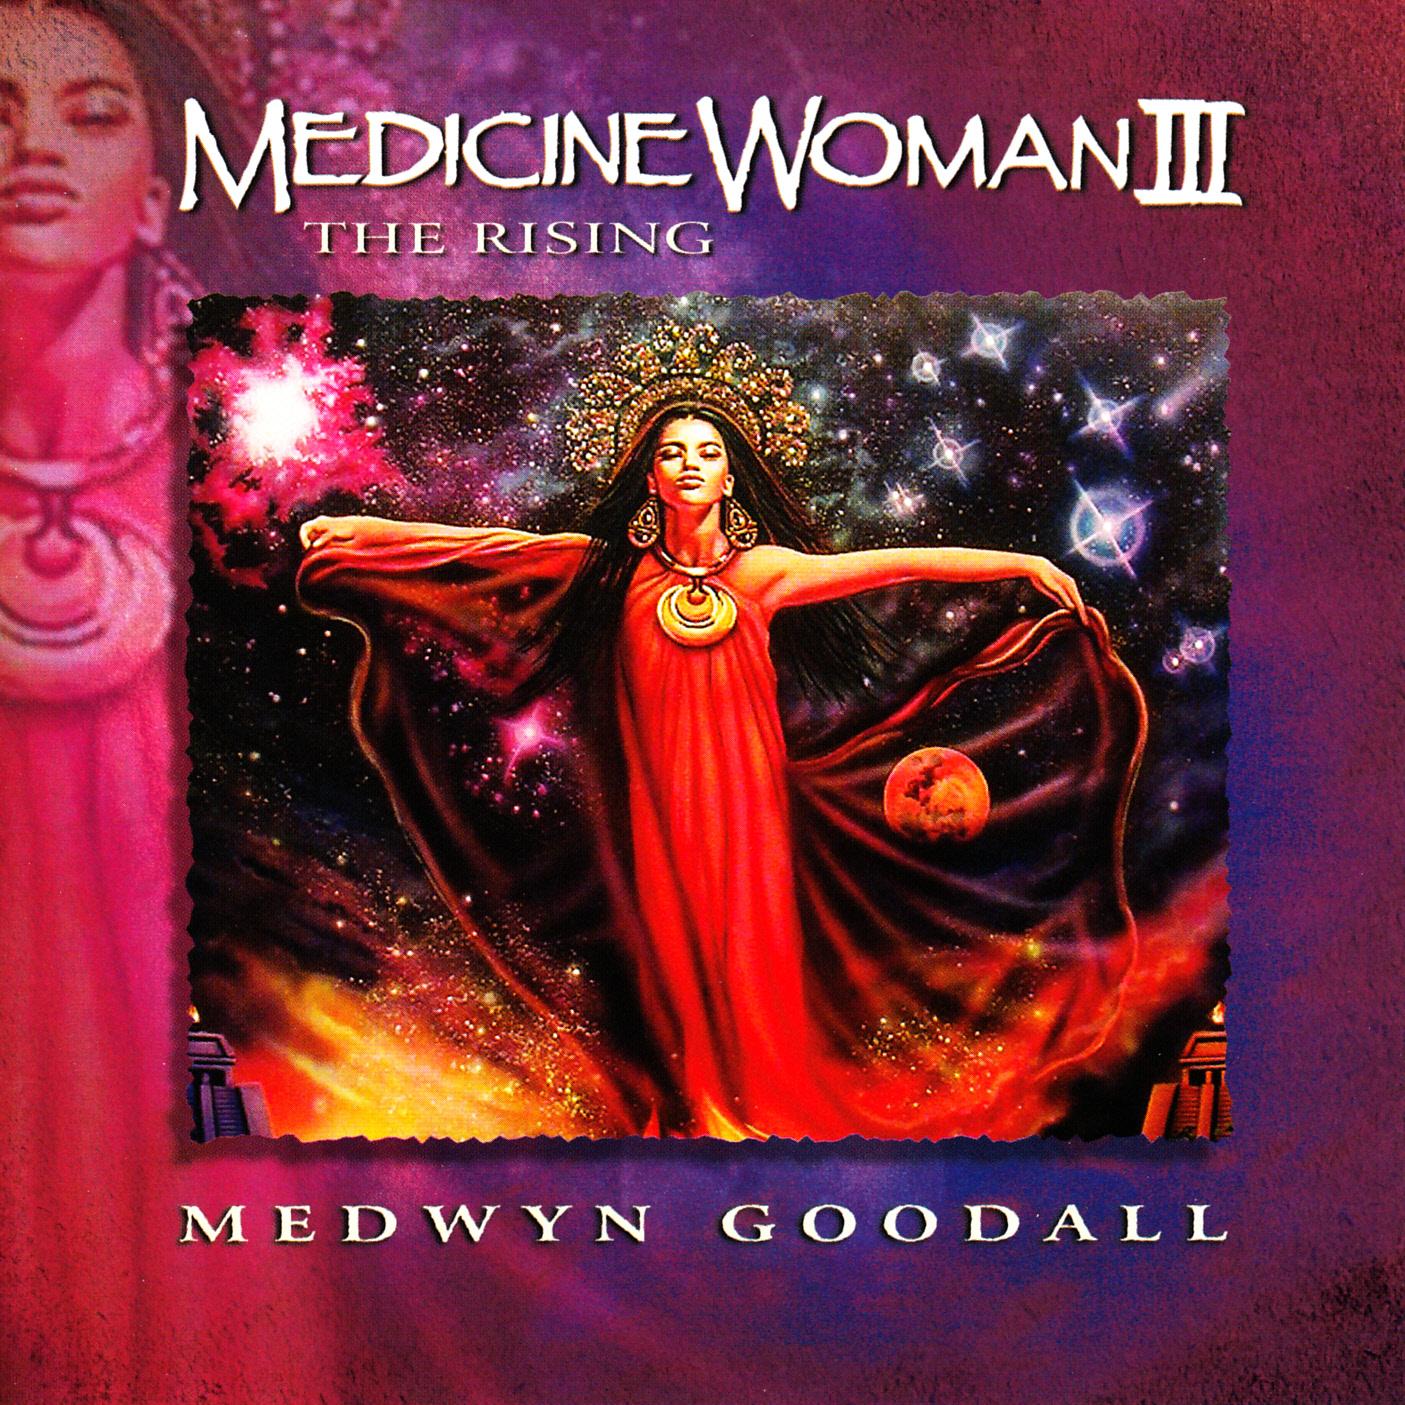 Cd568 Medicine Woman 3 The Rising New World Music